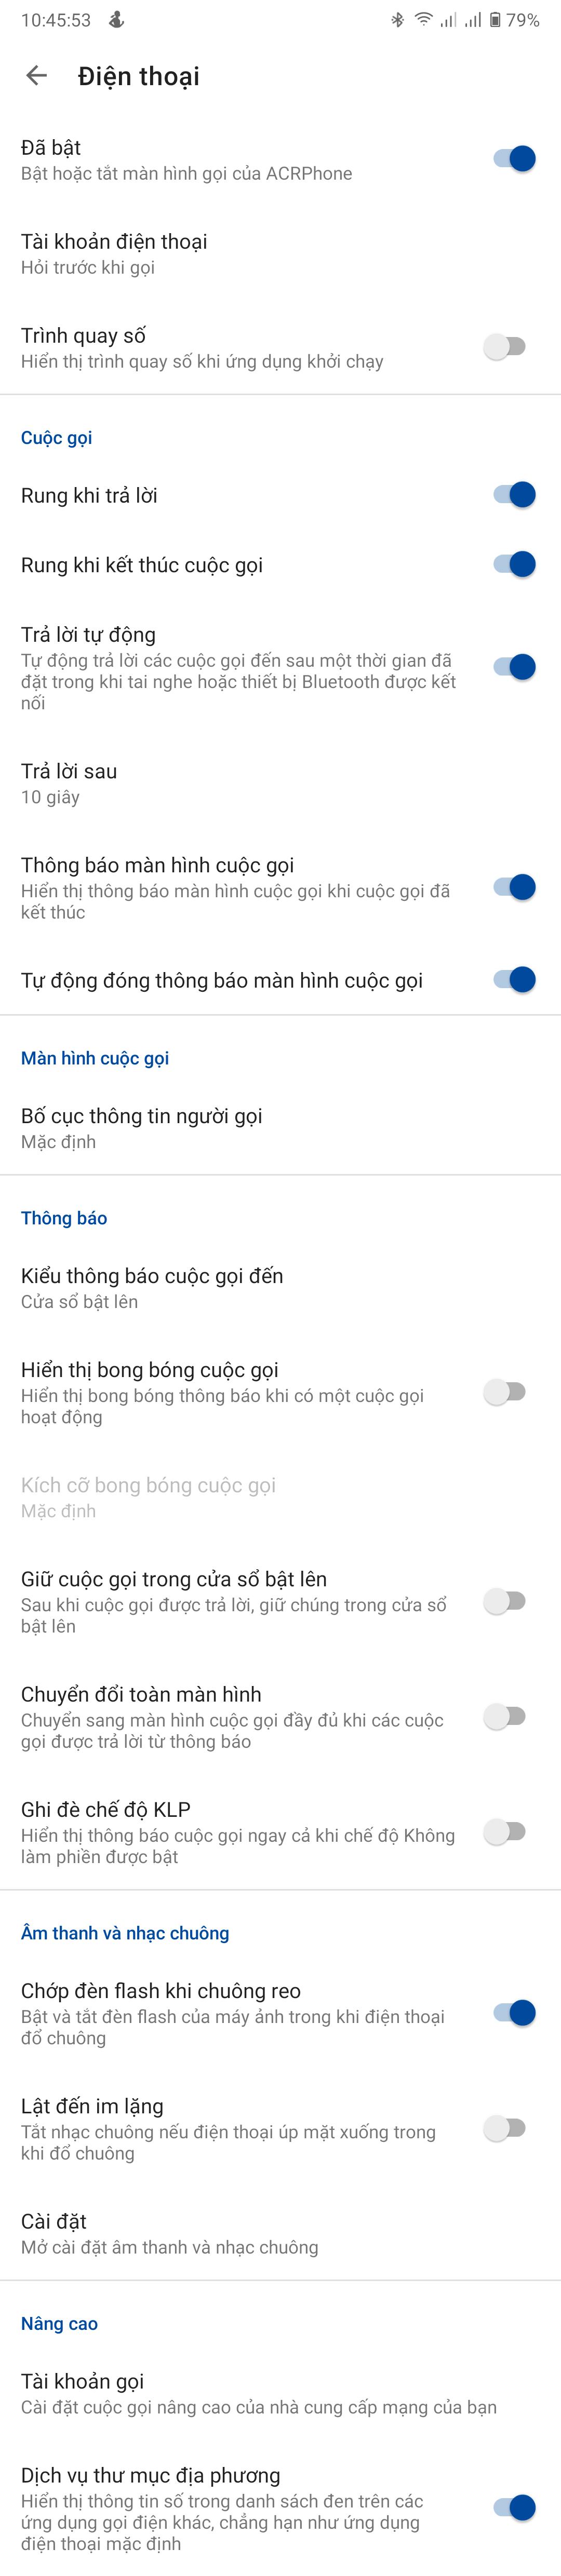 Screenshot_20210202_104605.png